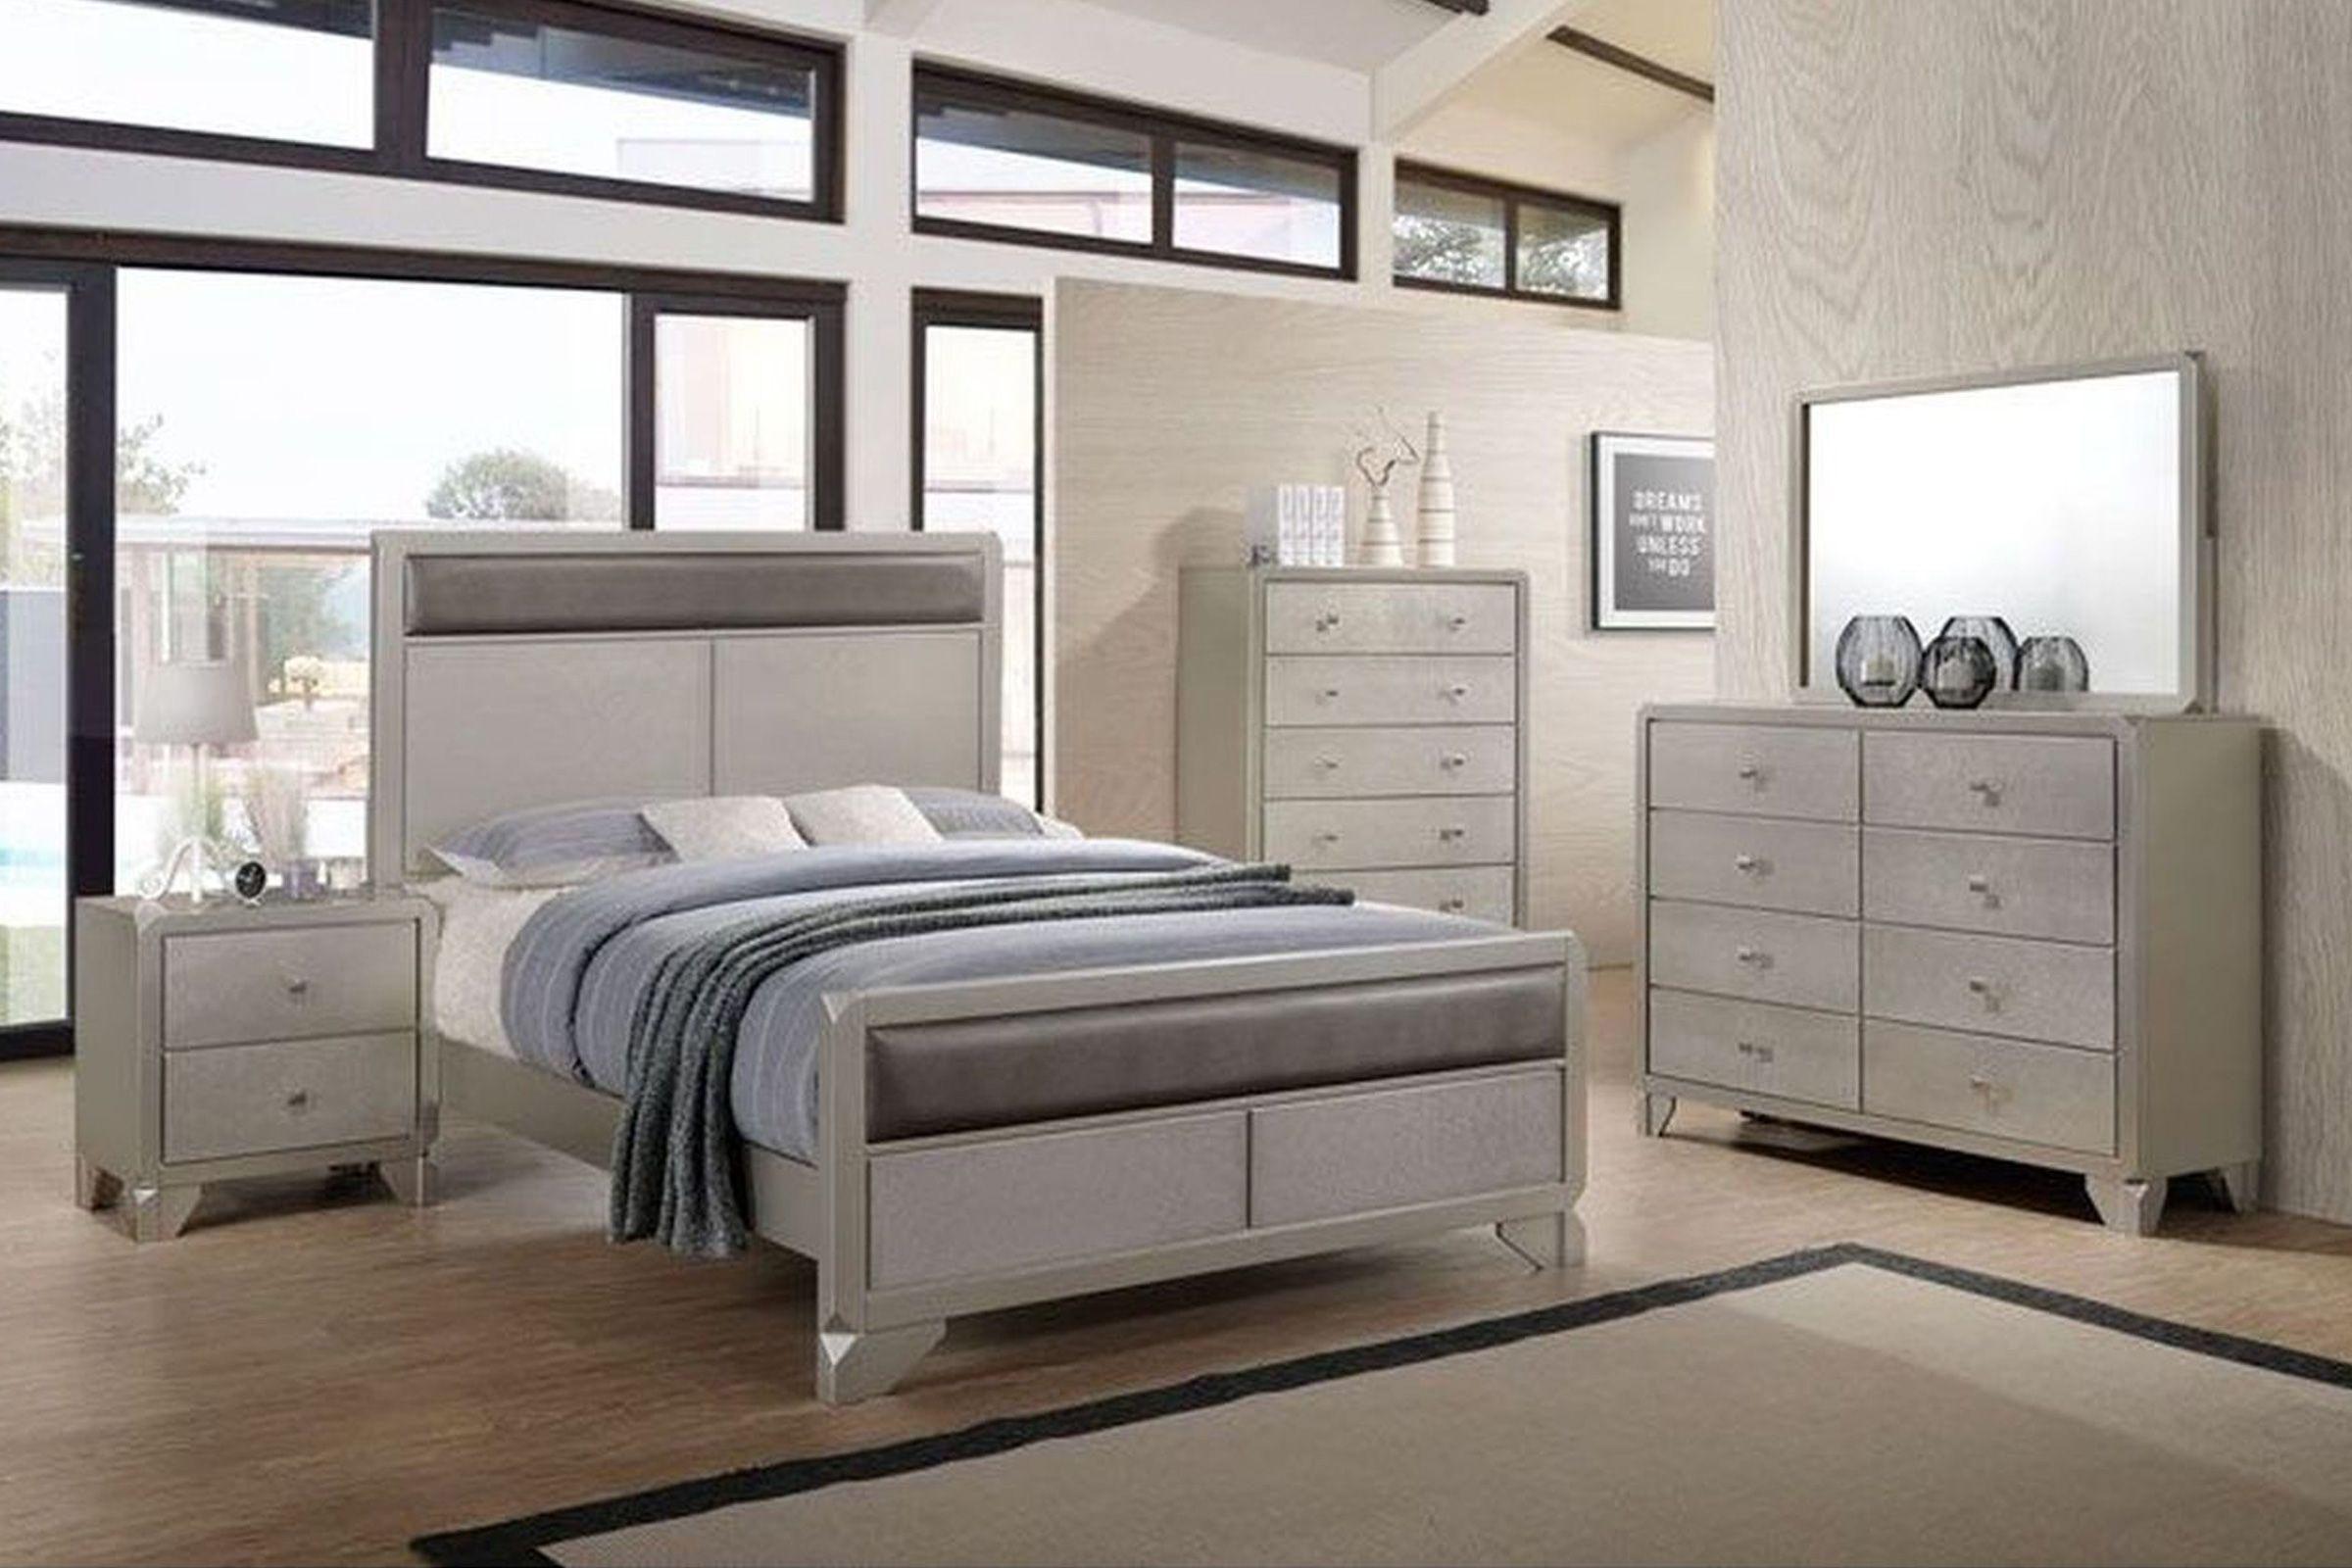 Noviss Bedroom Collection. Noviss